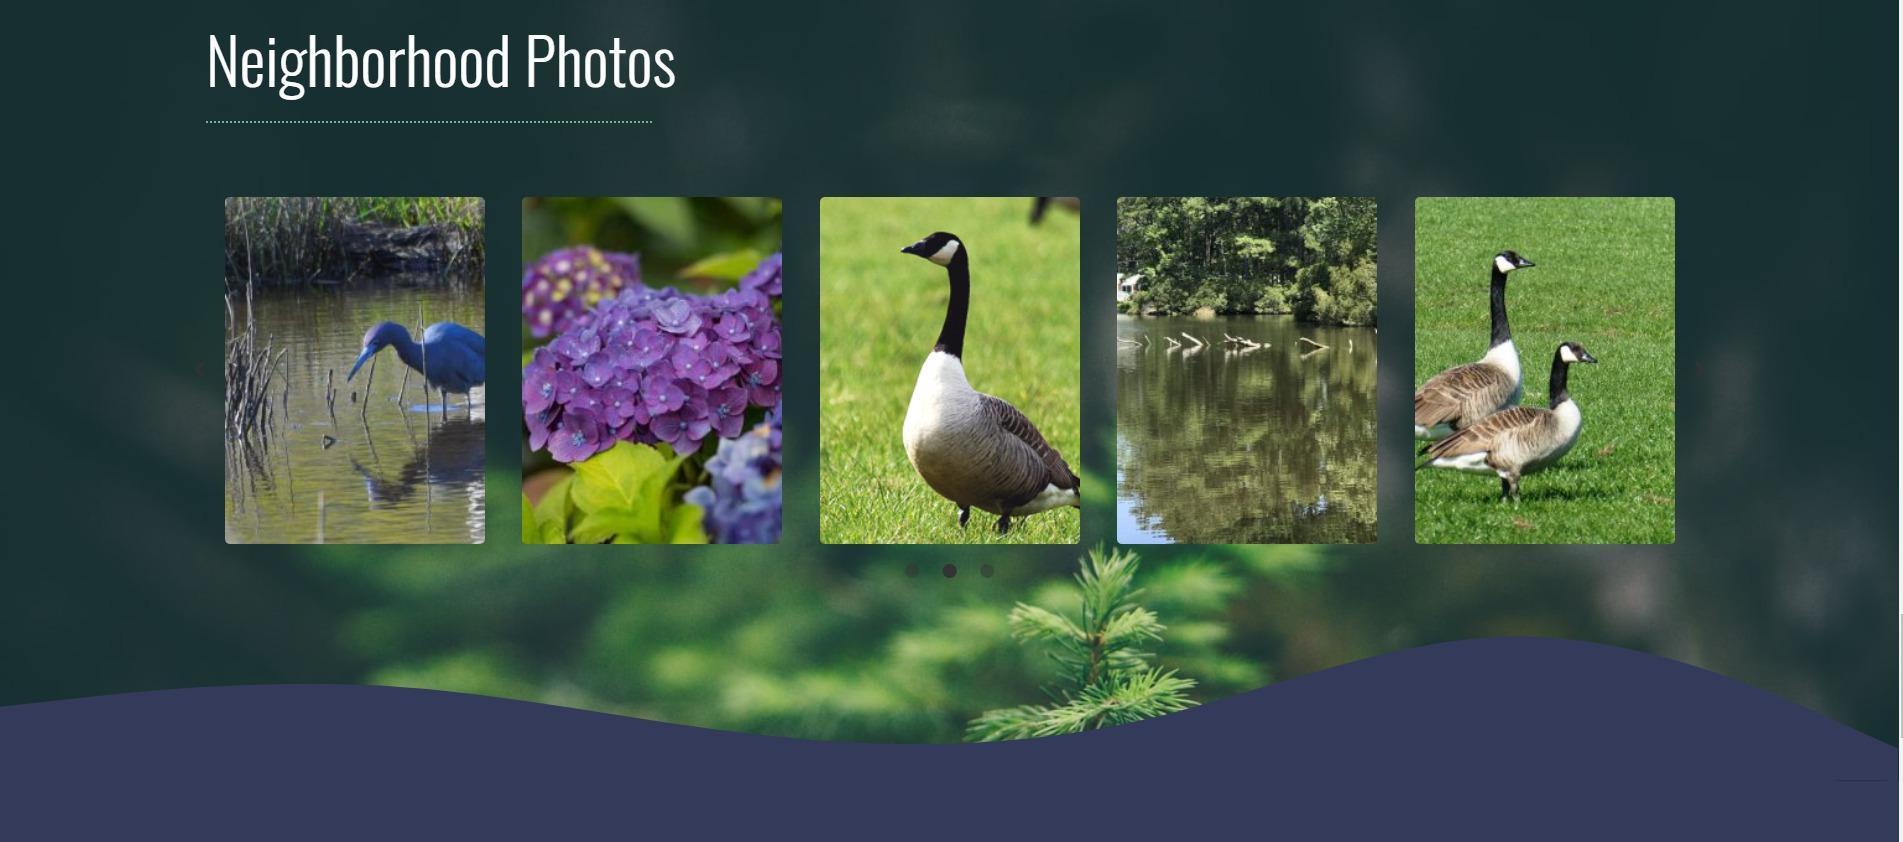 Neighborhood Photos - WordPress Website - Web Development - Web Design